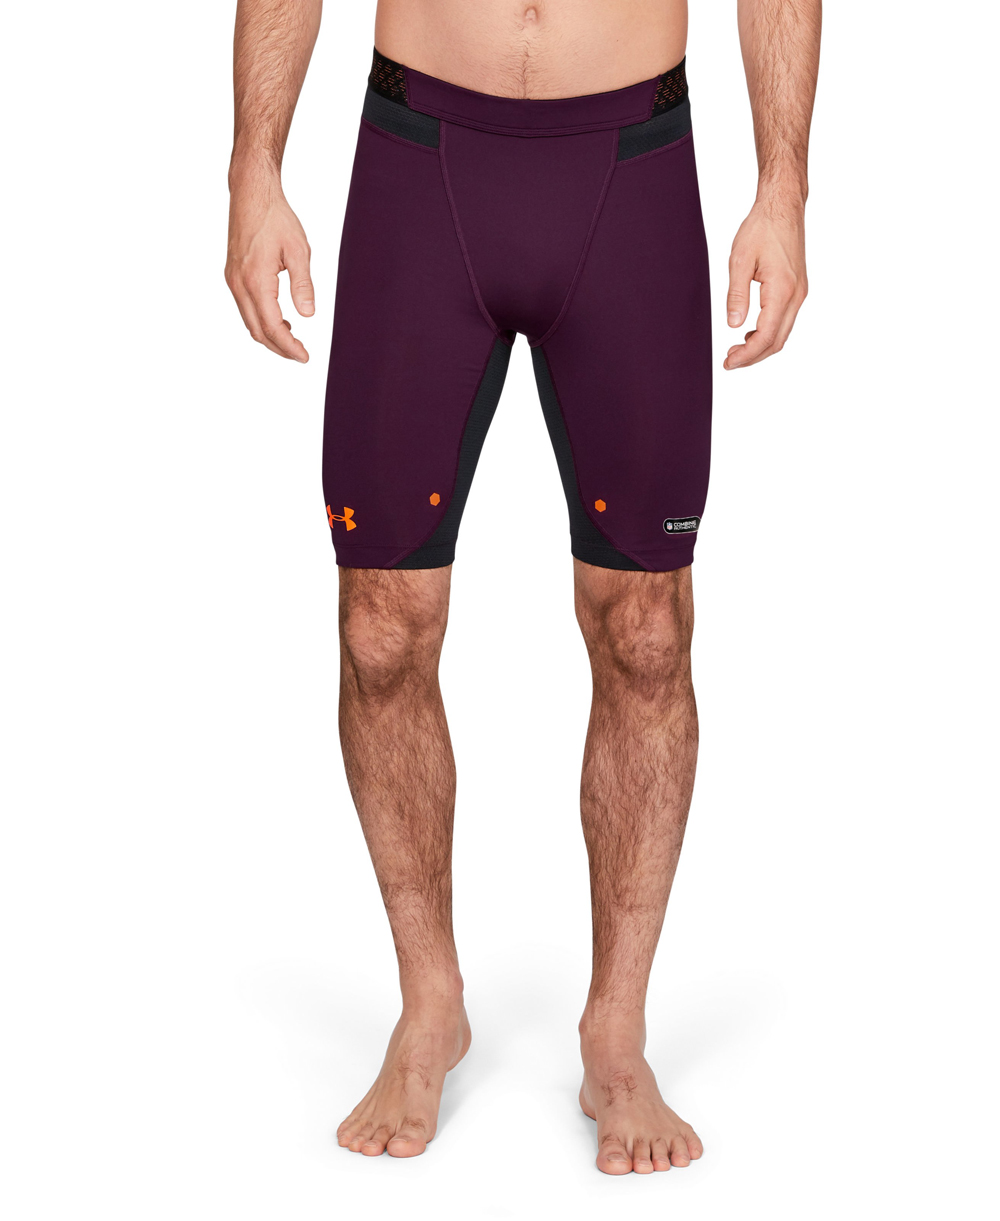 new styles 31b87 b9e2e NFL Combine Authentic Compression Men's Football Shorts Polaris Purple 501